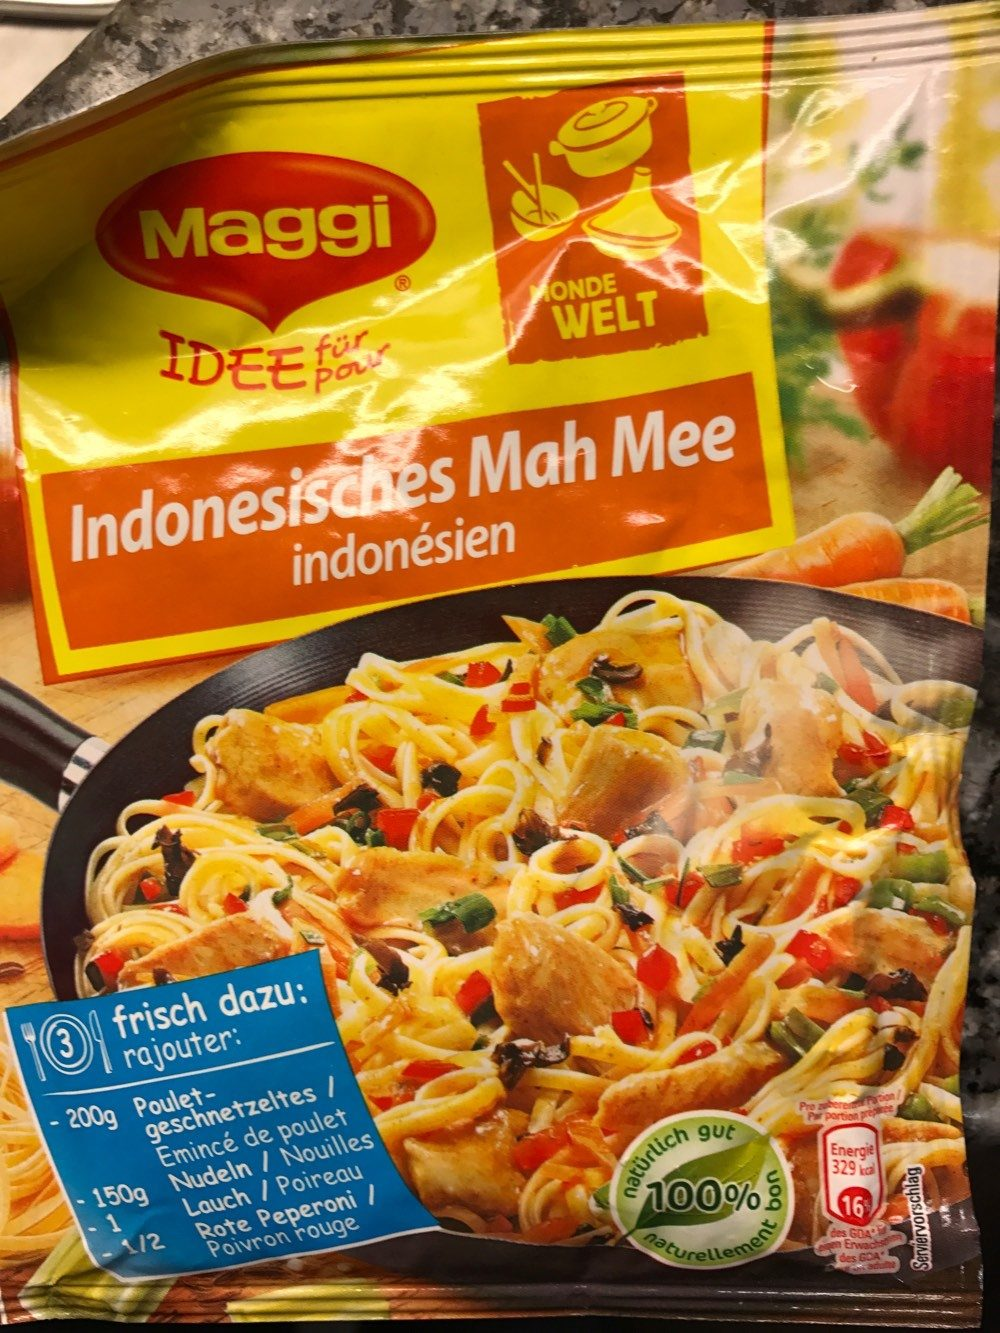 INDONESISCHES MAH MEE - Product